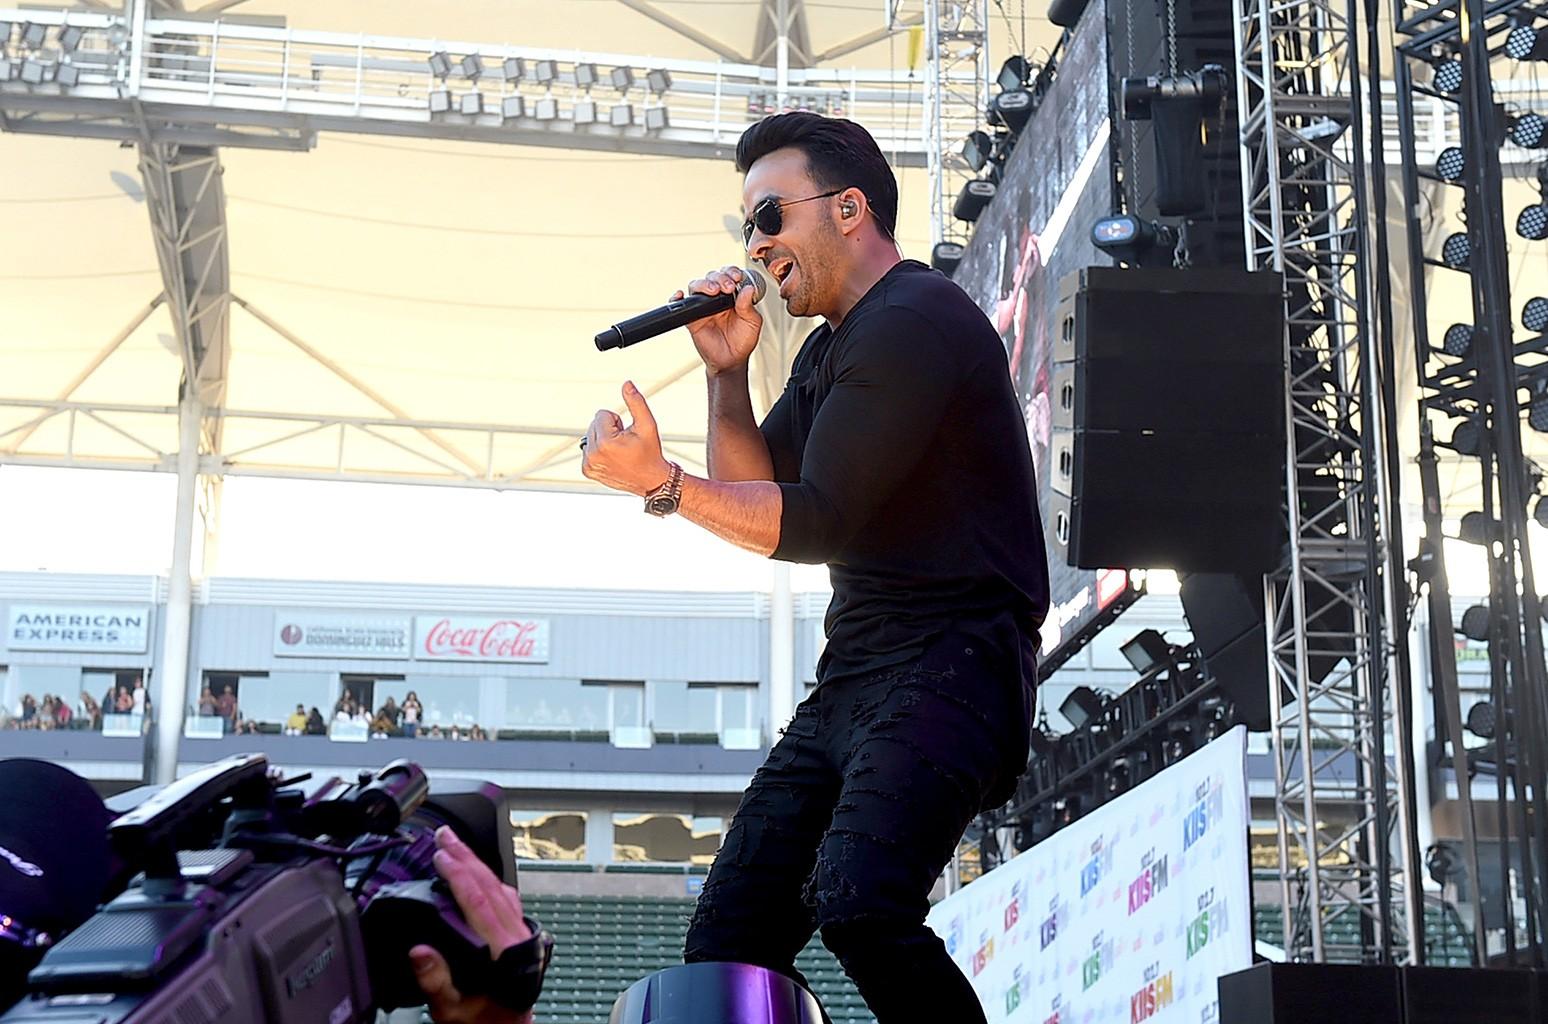 Luis Fonsi performs onstage during 102.7 KIIS FM's 2017 Wango Tango at StubHub Center on May 13, 2017 in Carson, Calif.